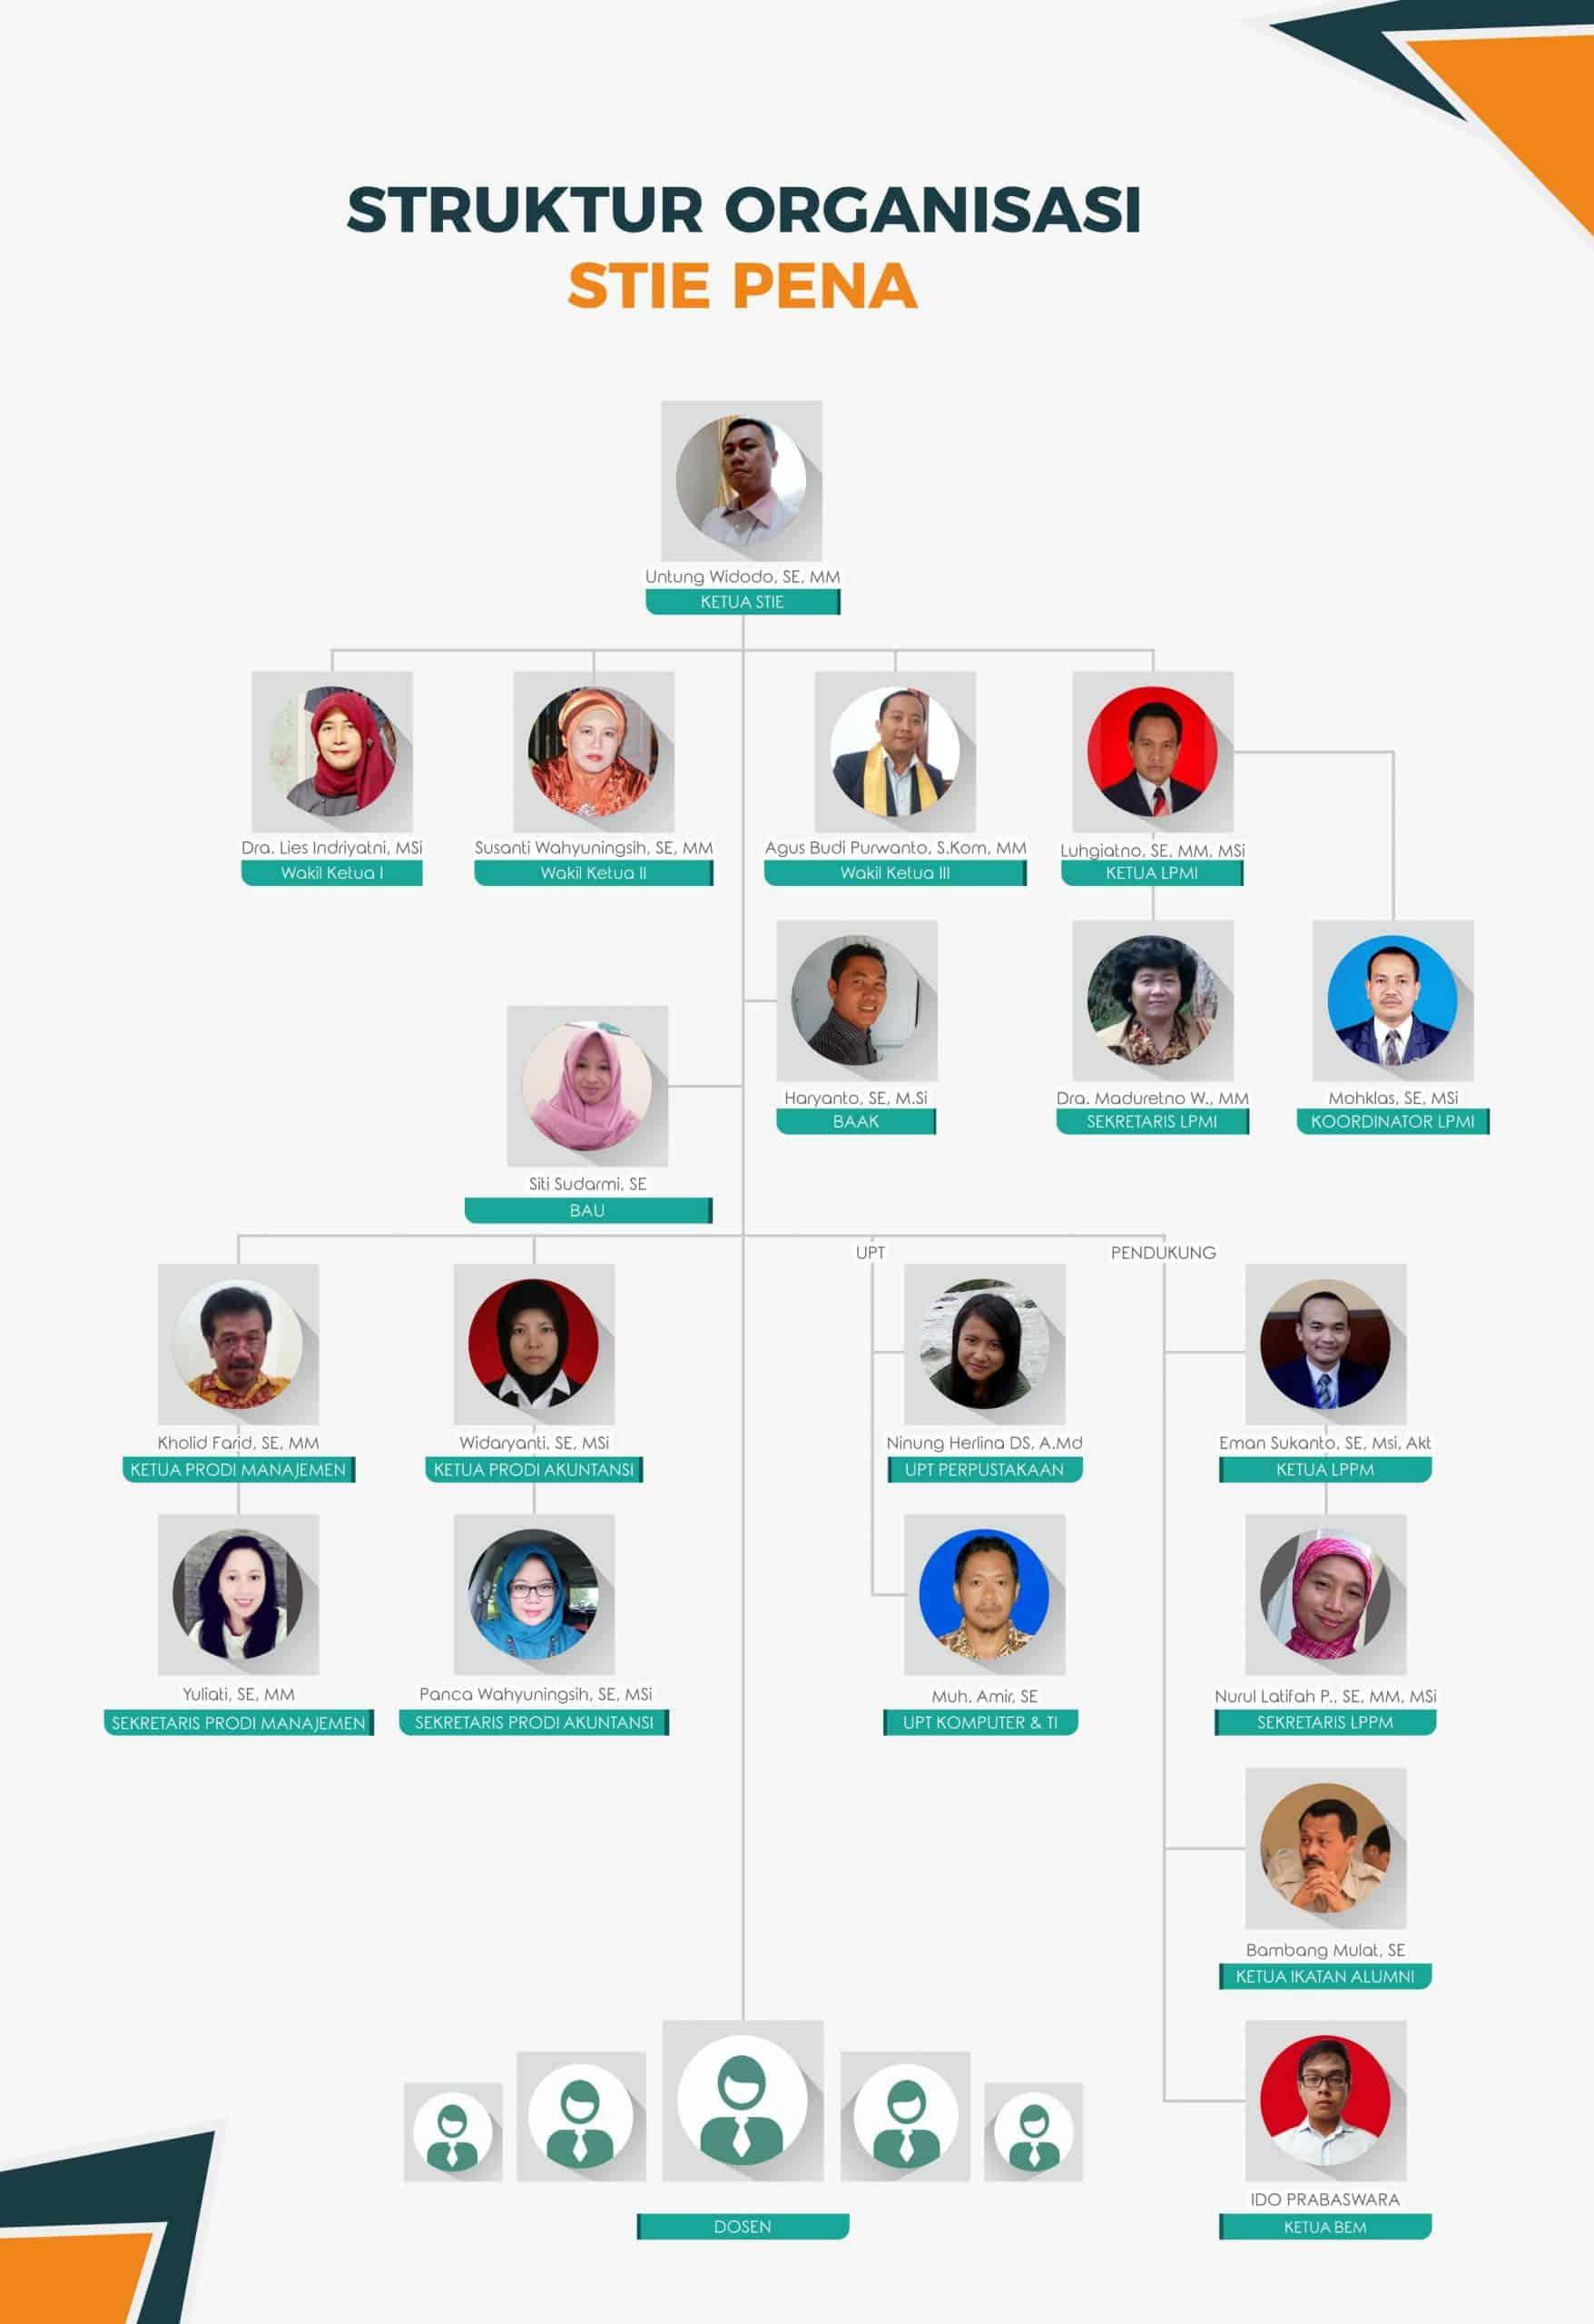 struktur organisasi stie pena